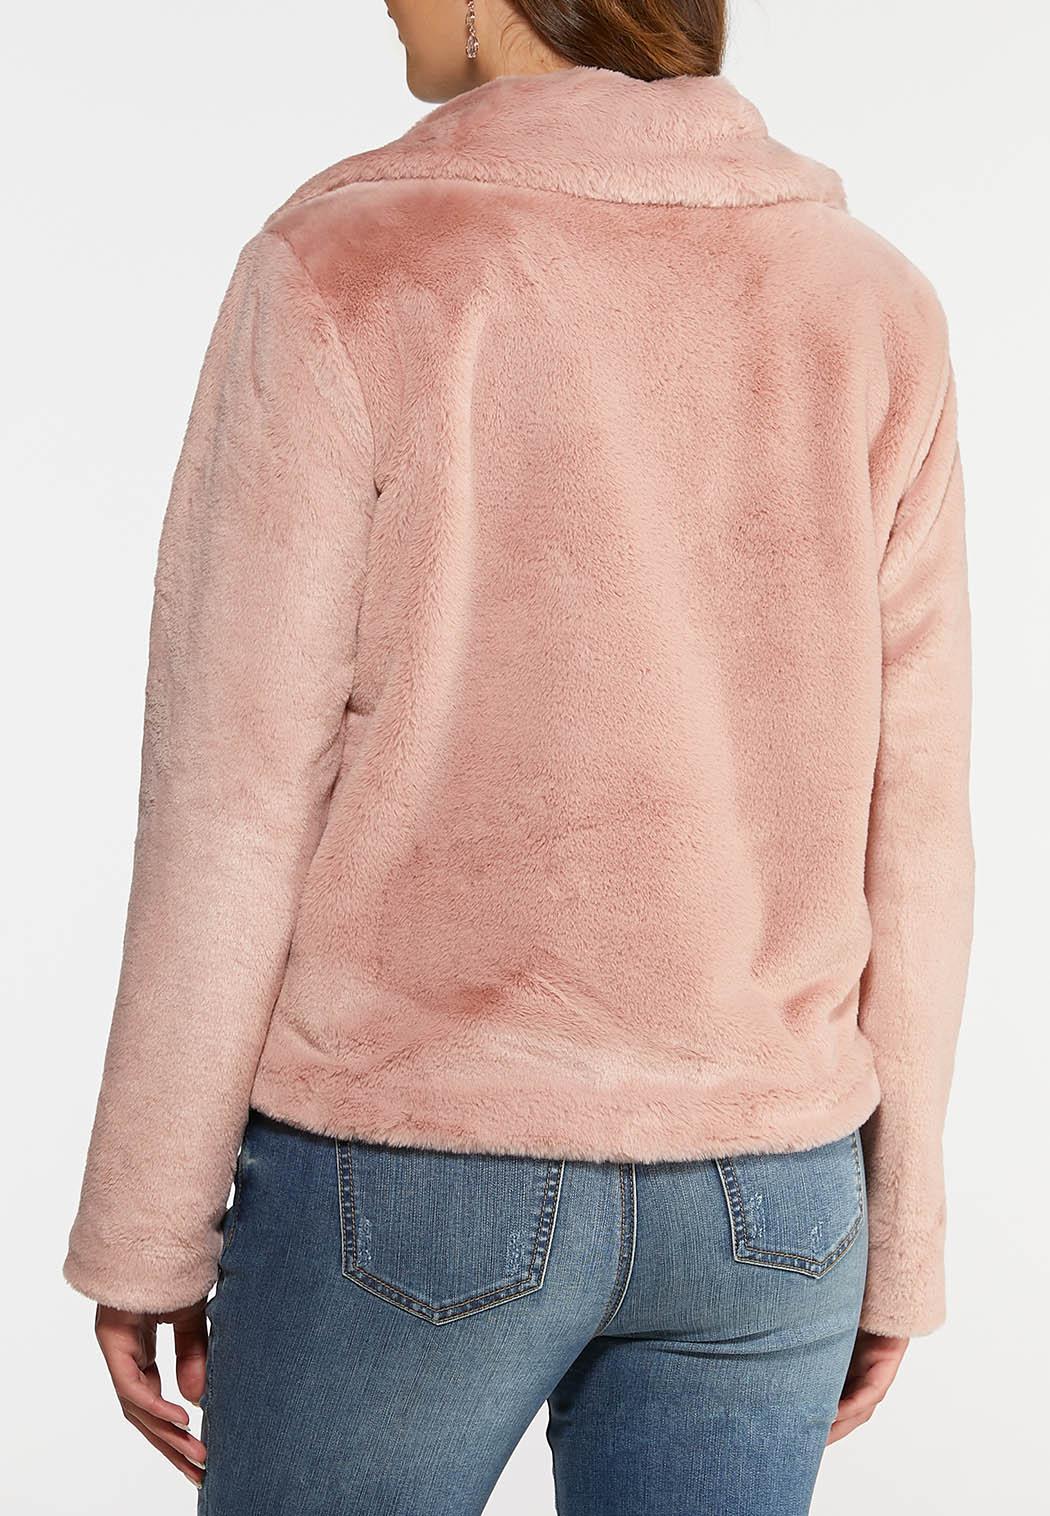 Blush Faux Fur Jacket (Item #44032132)